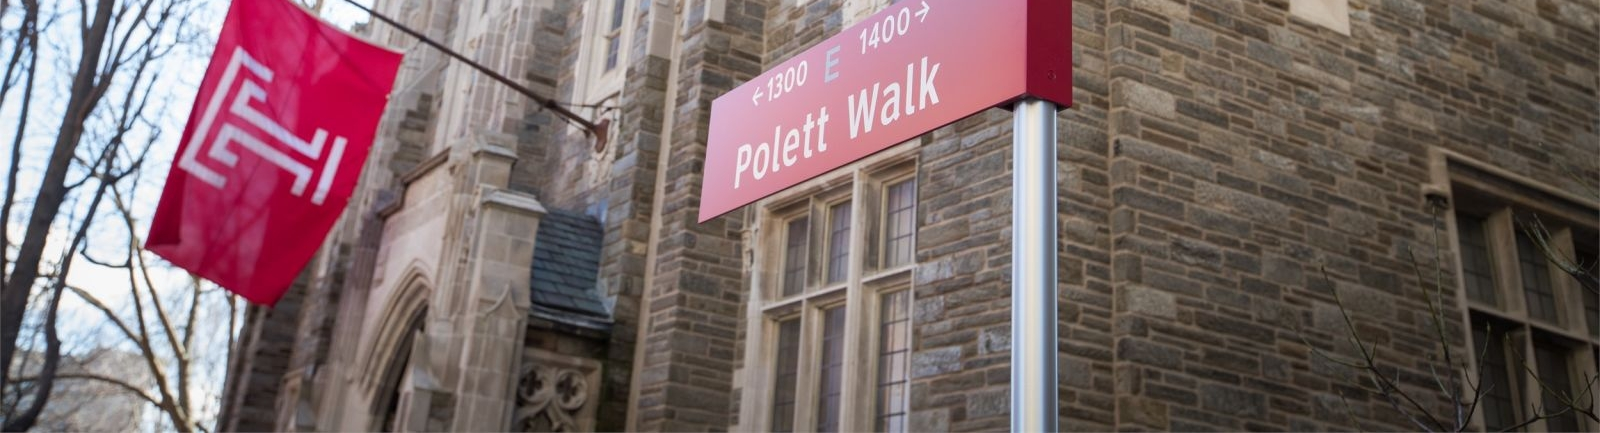 Polett Walk and Beasley Walk signs on Temple University's main campus.